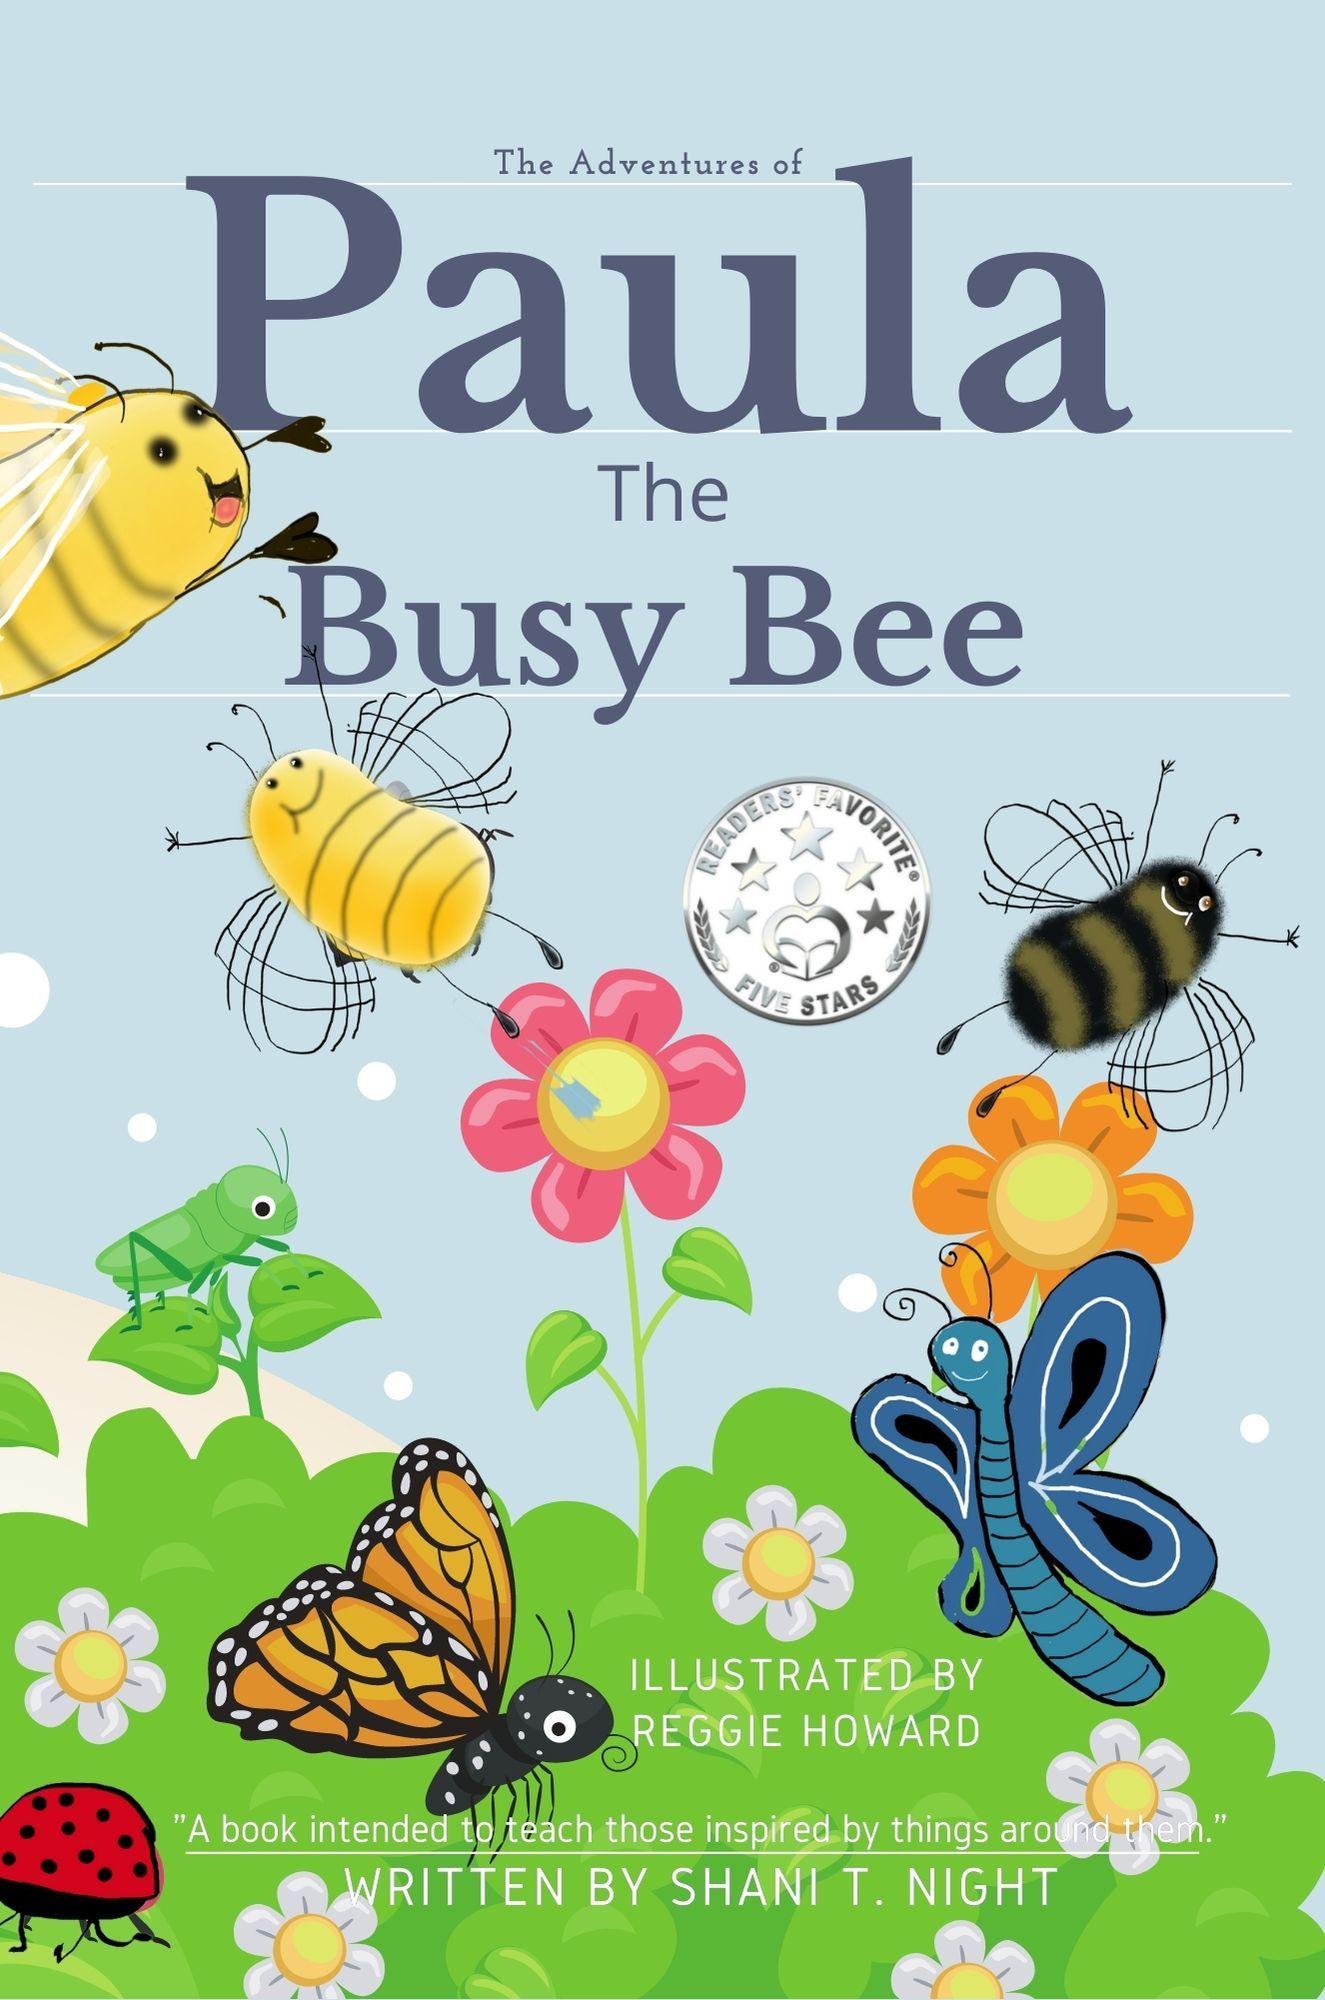 Paula The Busy Bee's Book Image